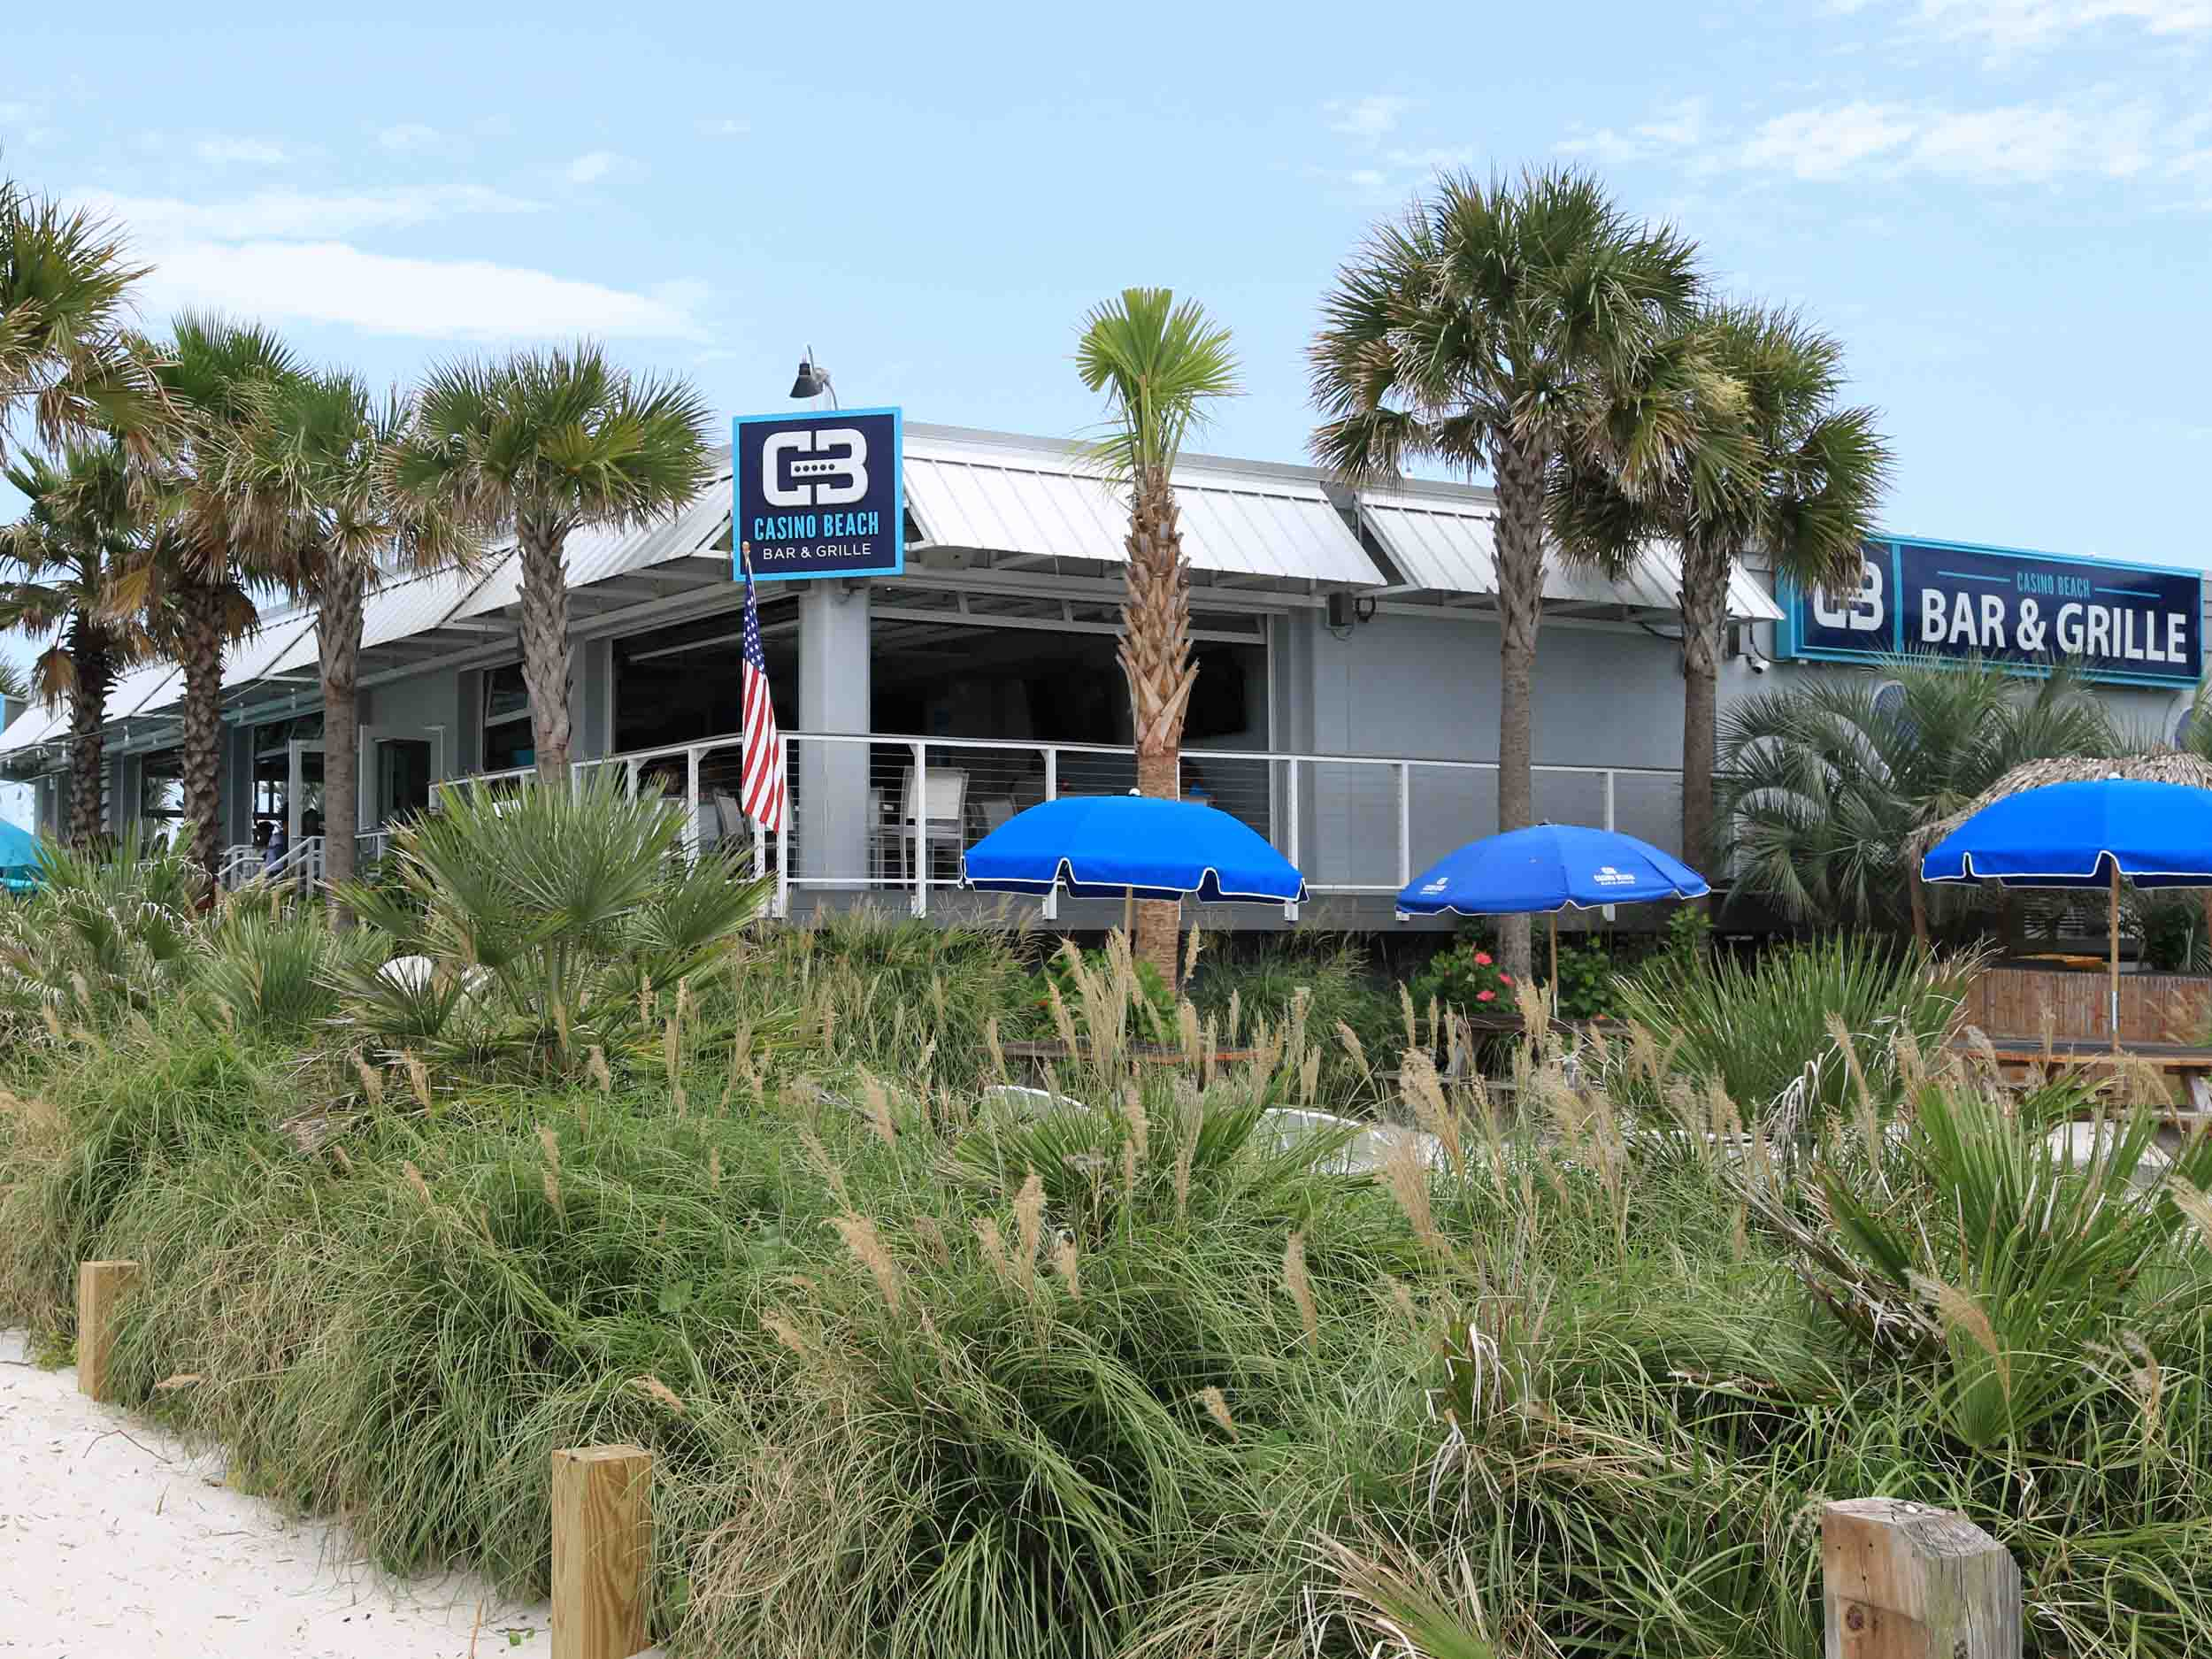 Casino Beach Bar